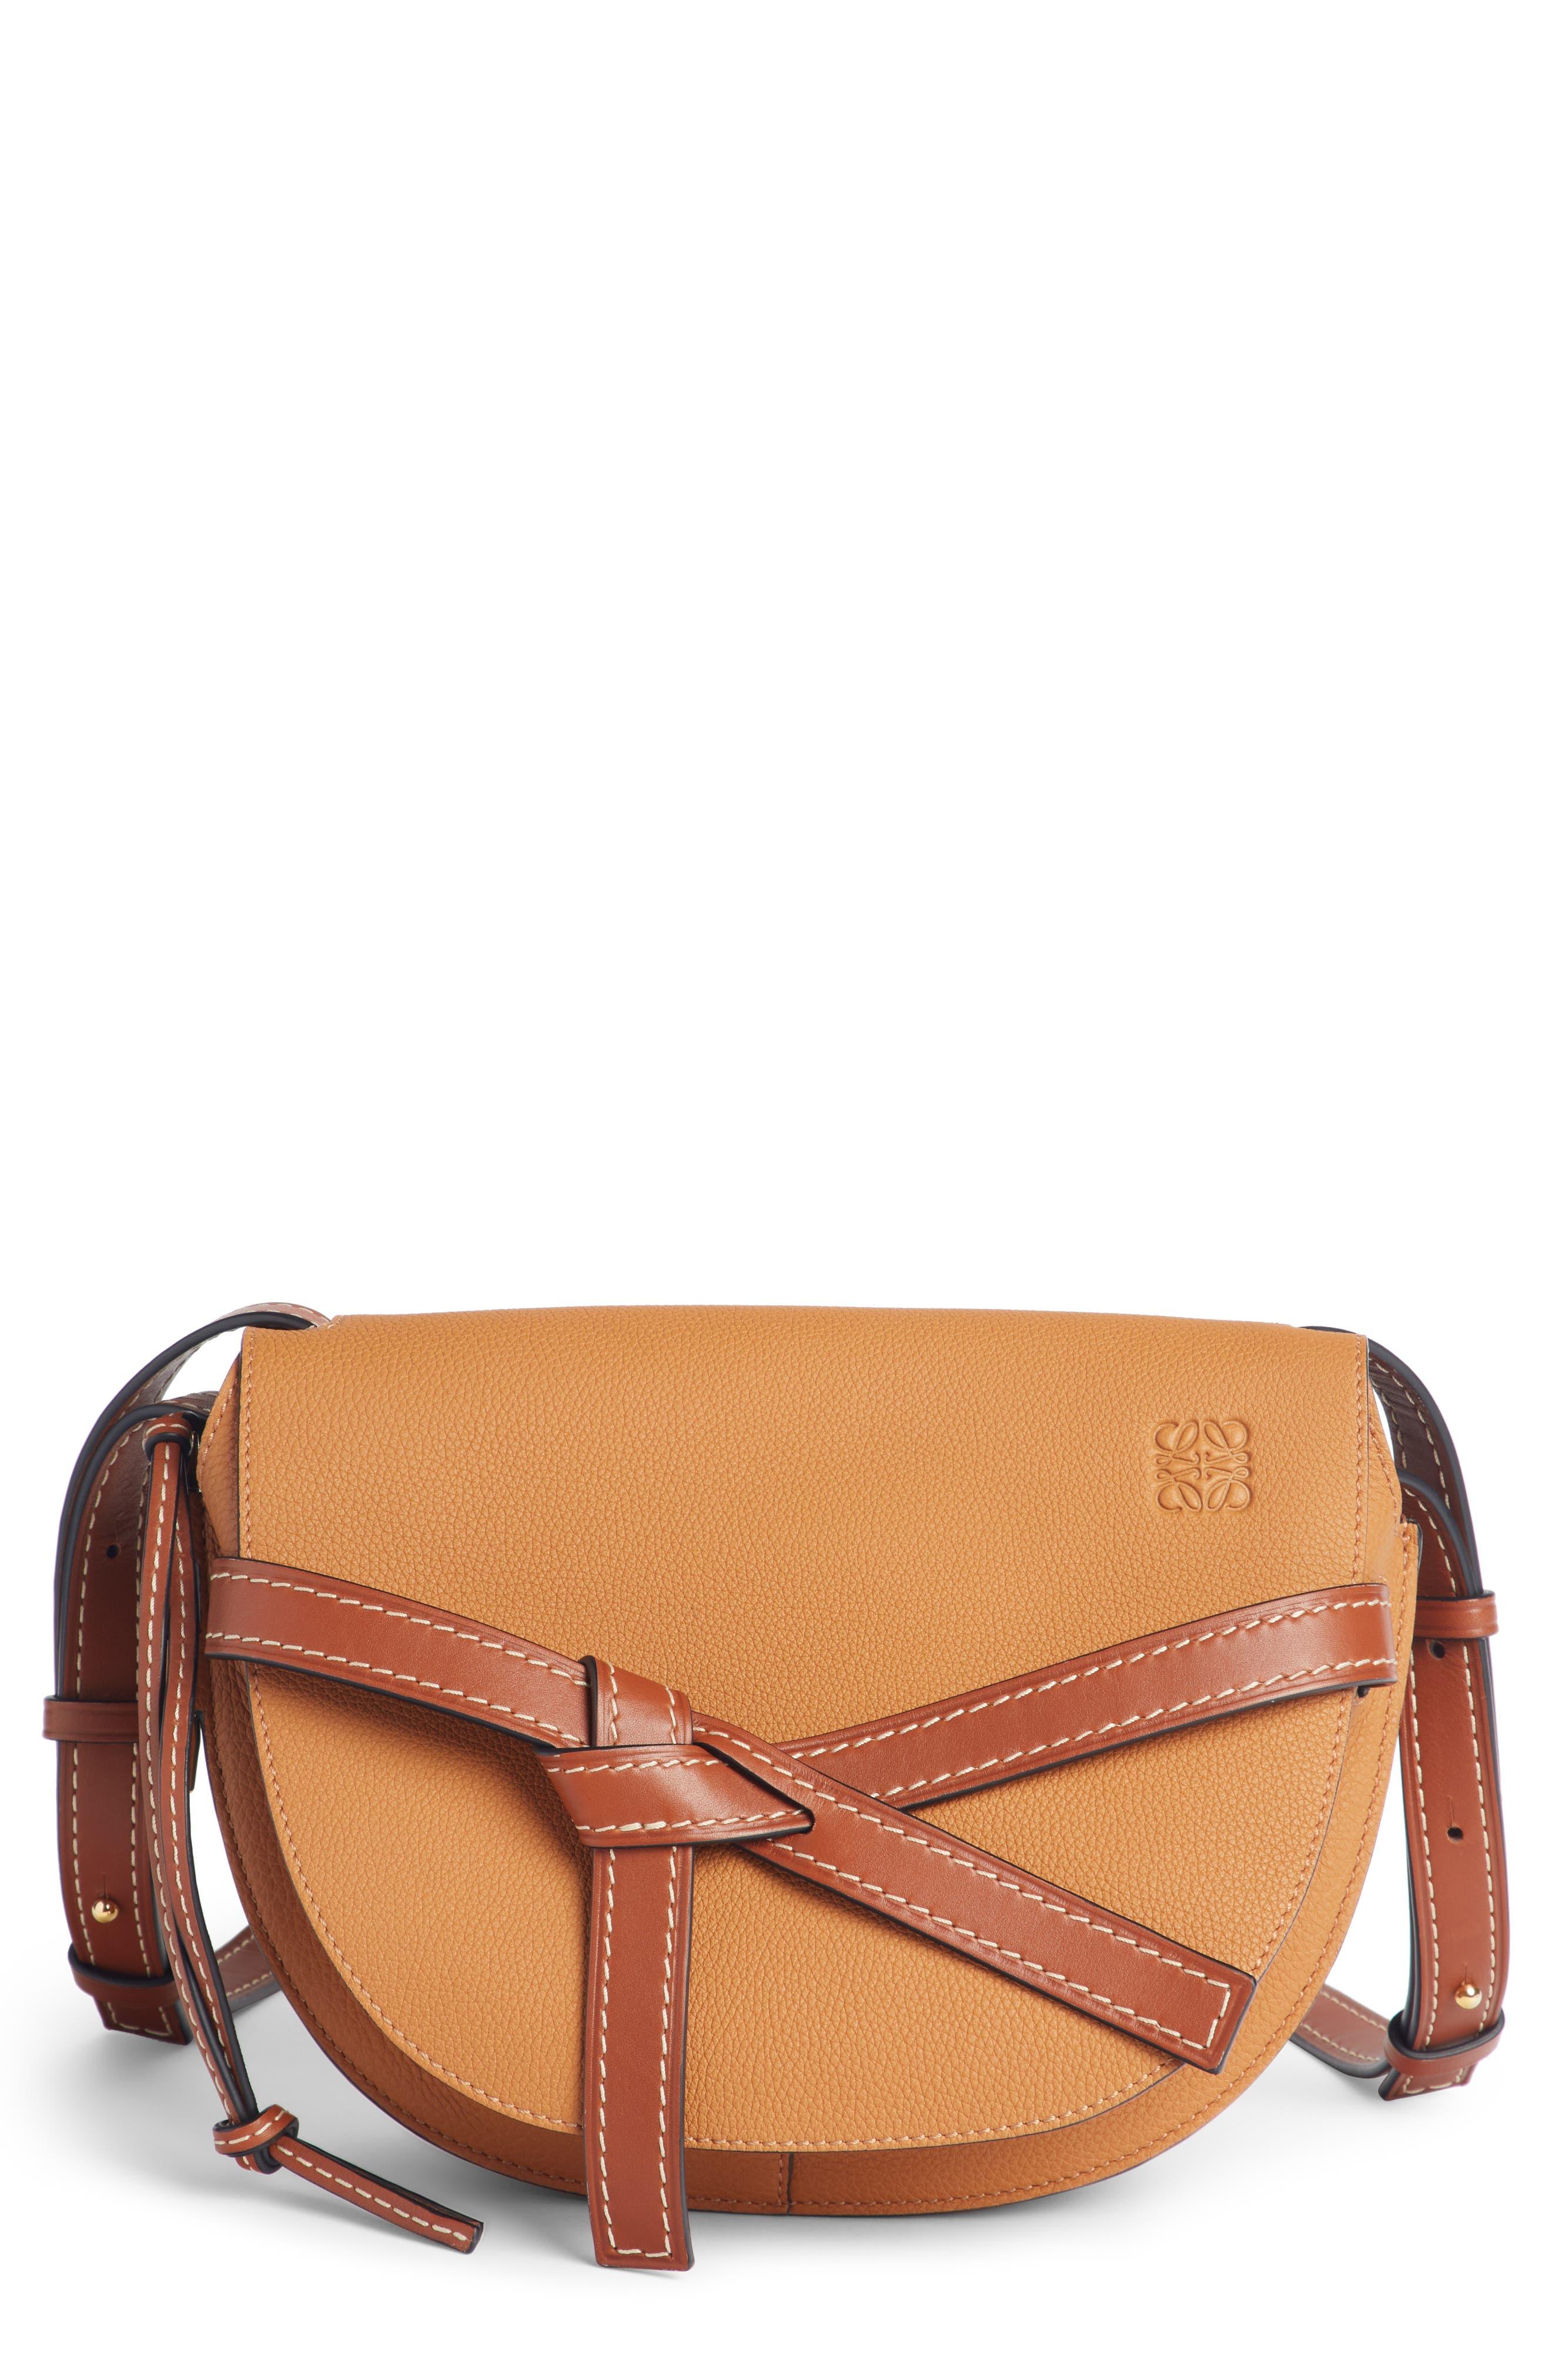 Small Gate Leather Crossbody Bag,                             Main thumbnail 1, color,                             LIGHT CARAMEL/ PECAN